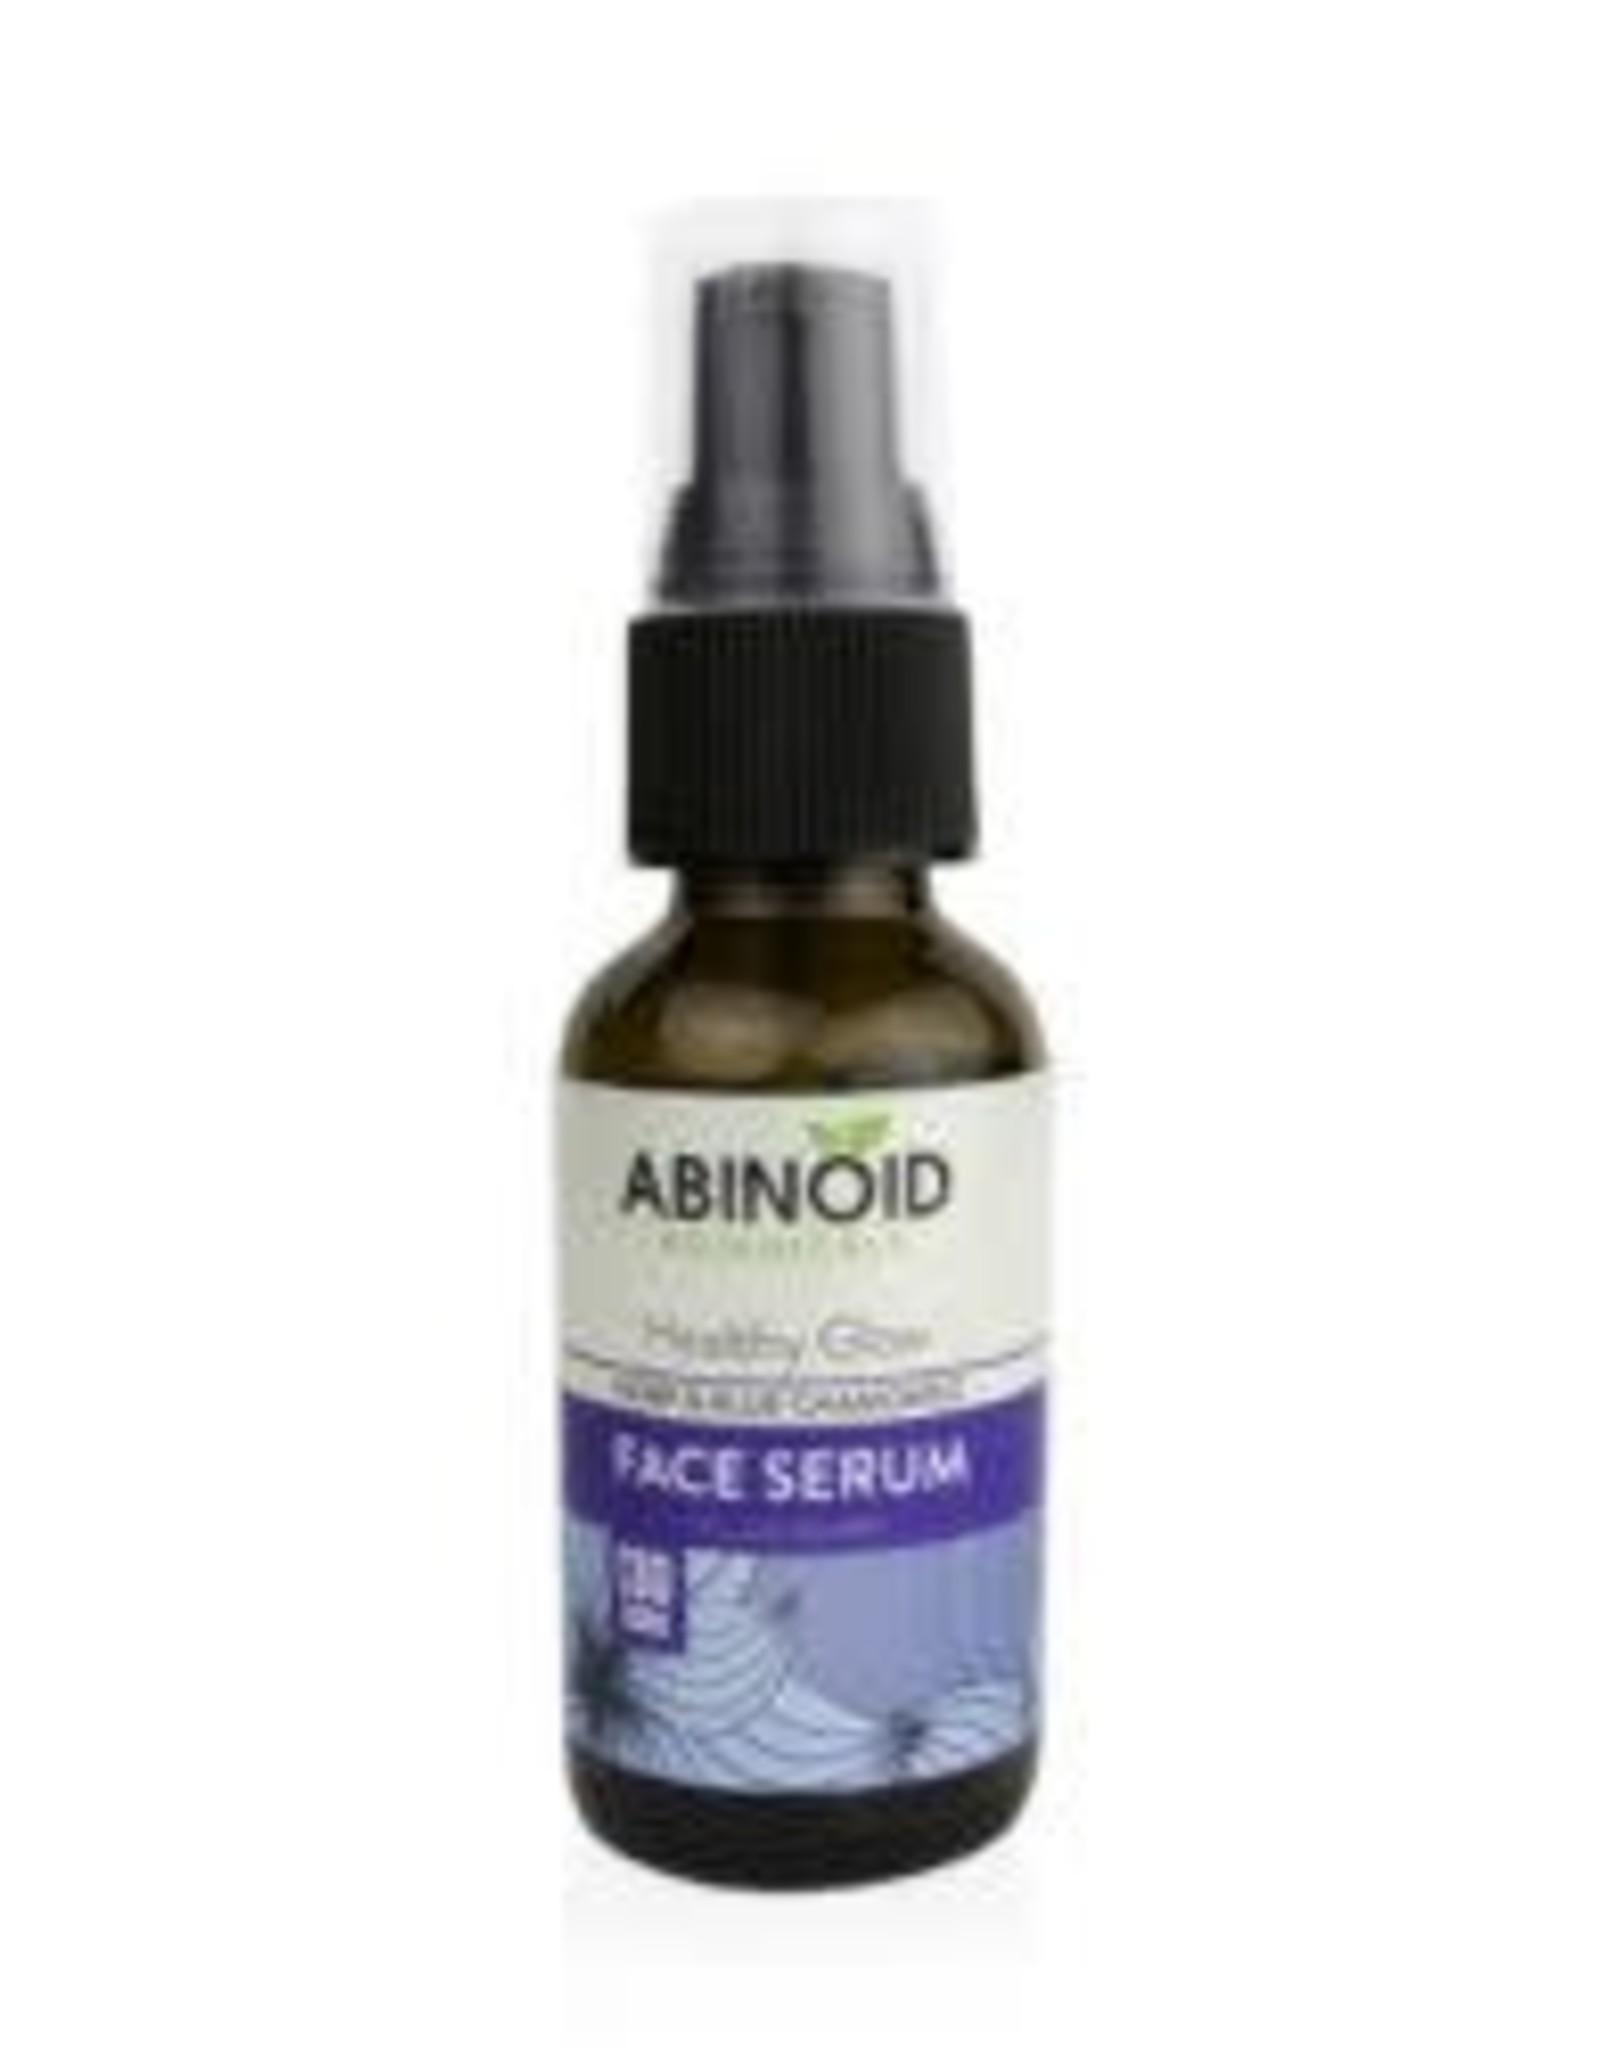 Abinoid Face Serum 100mg